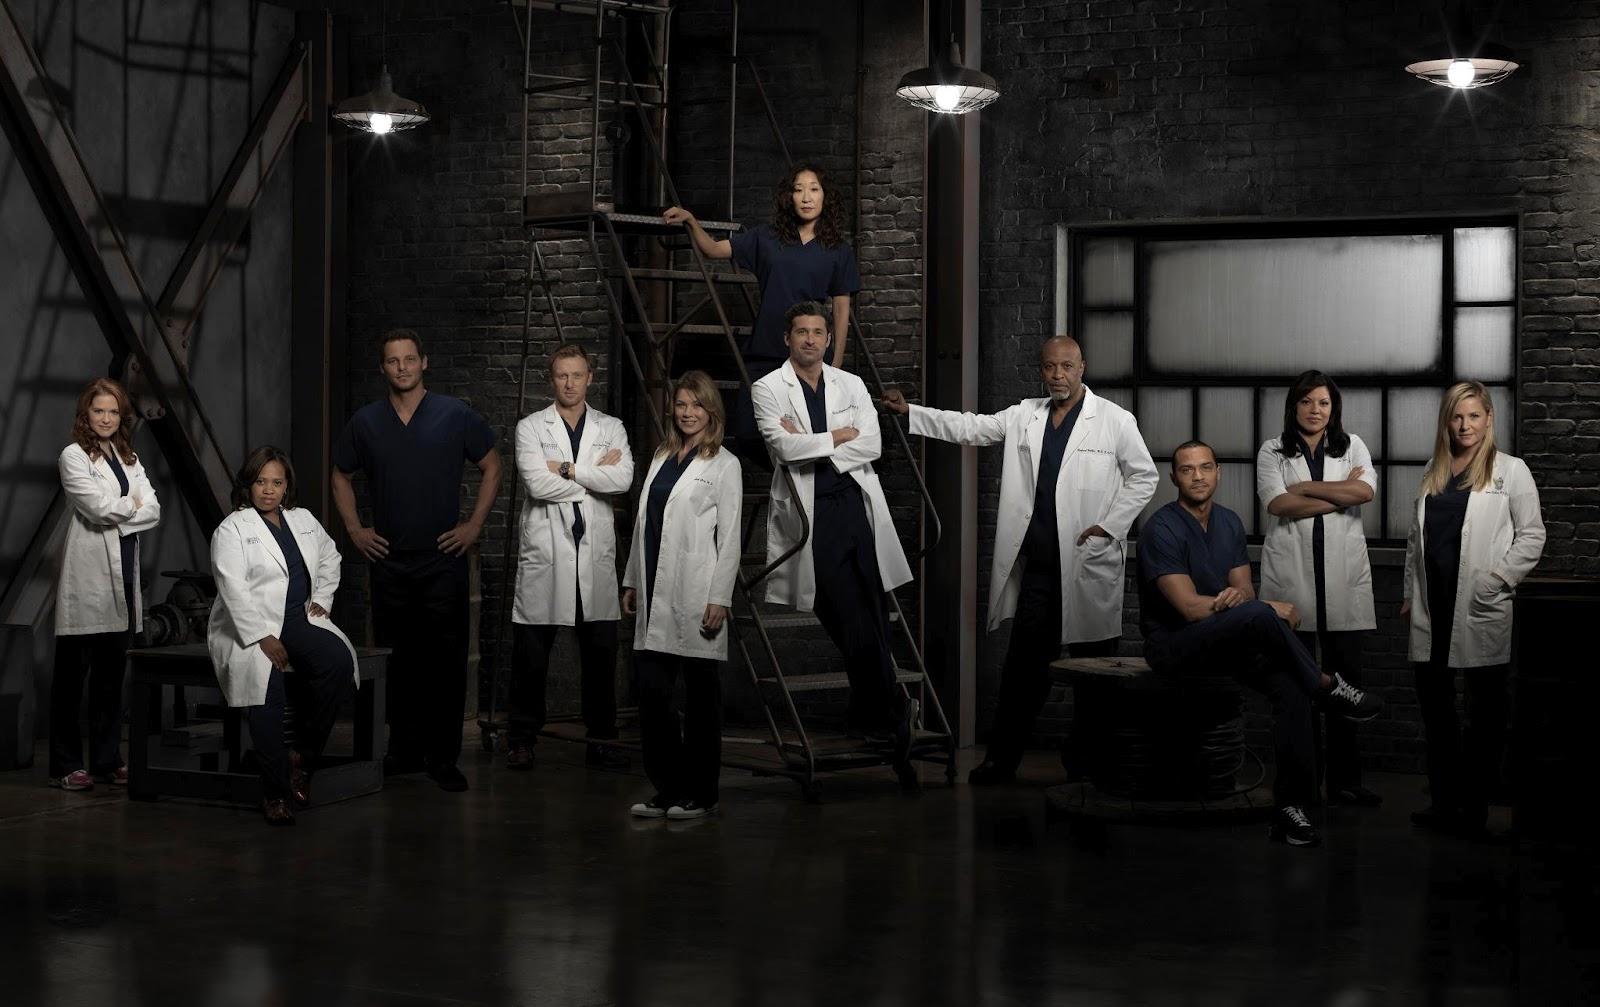 Grey's Anatomy (Chirurdzy) sezon 10 - soundtrack!